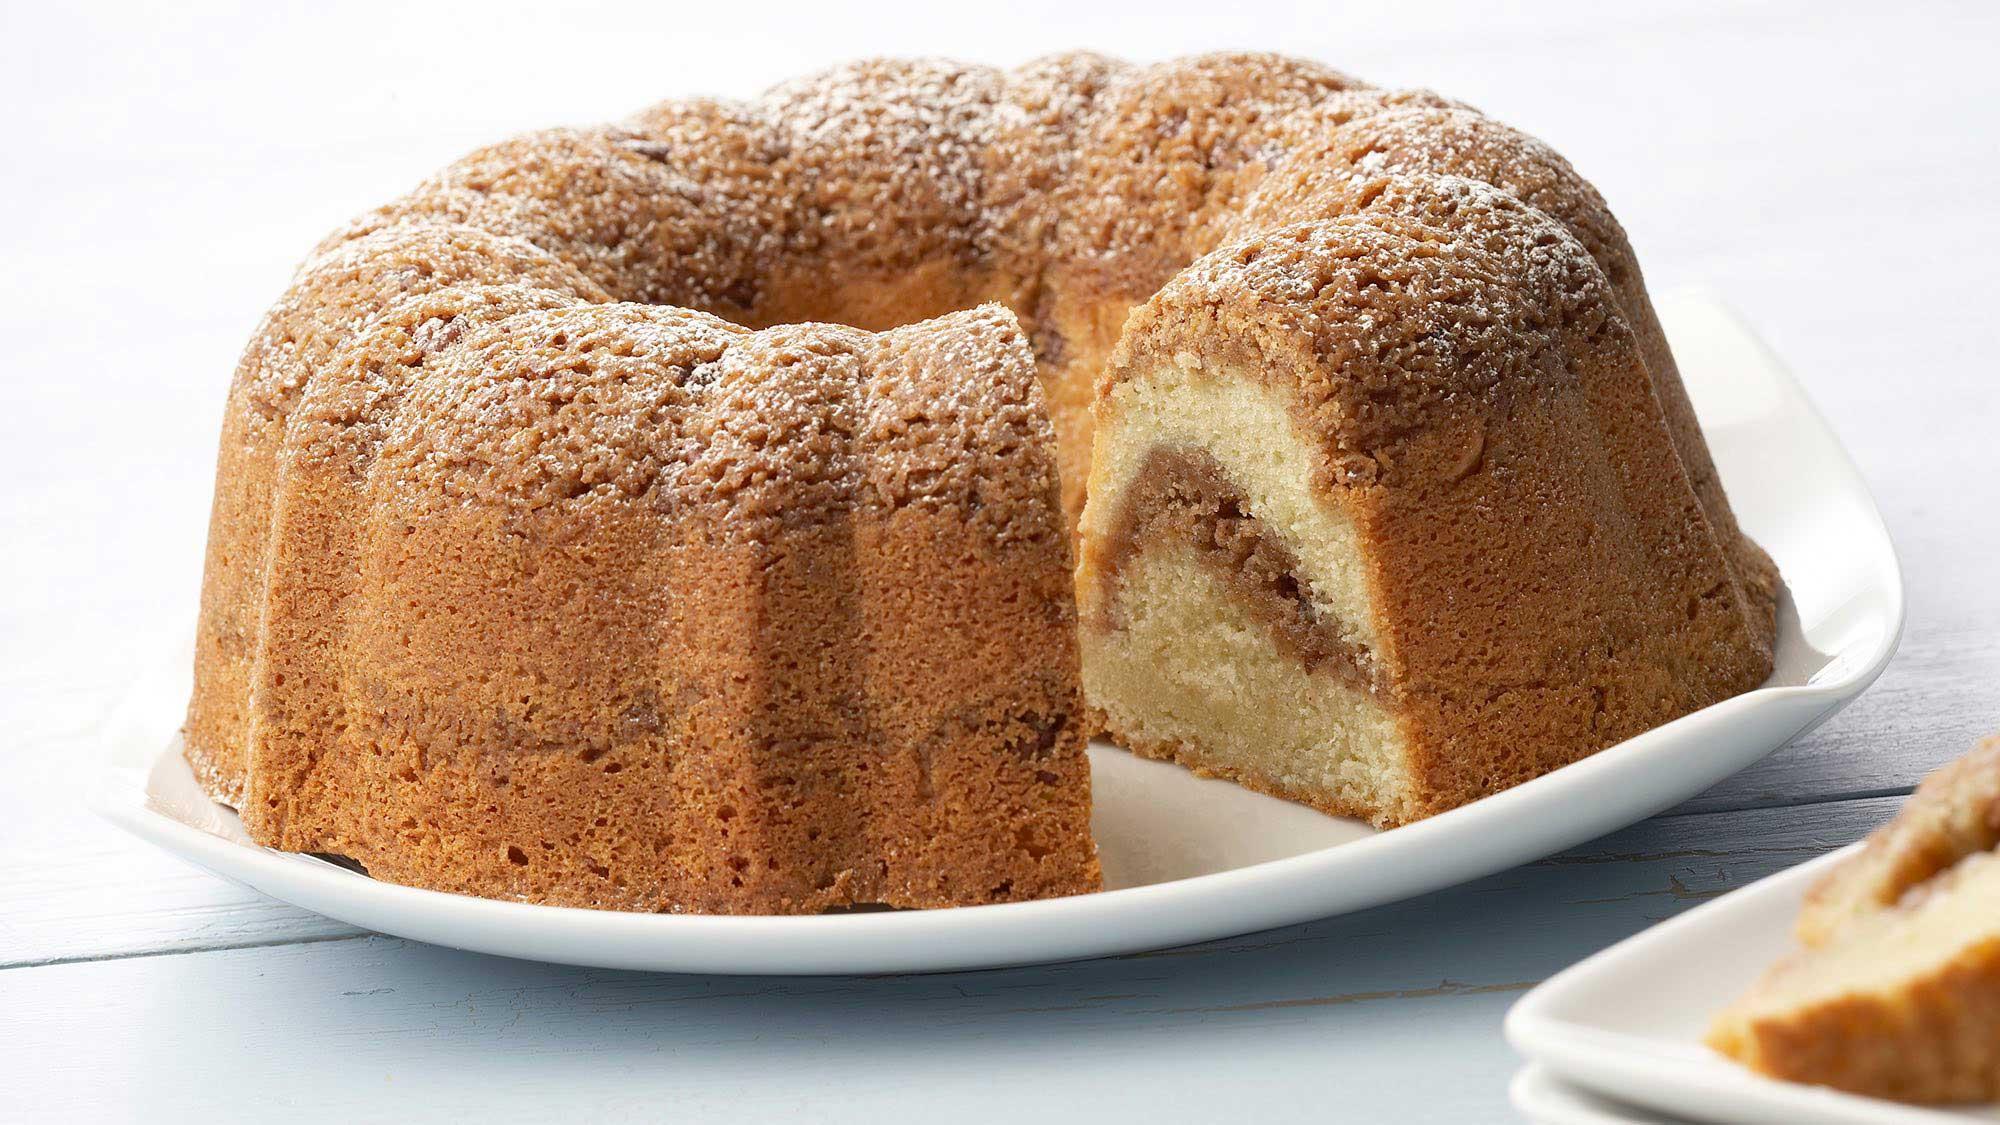 McCormick Cinnamon Streusel Cake